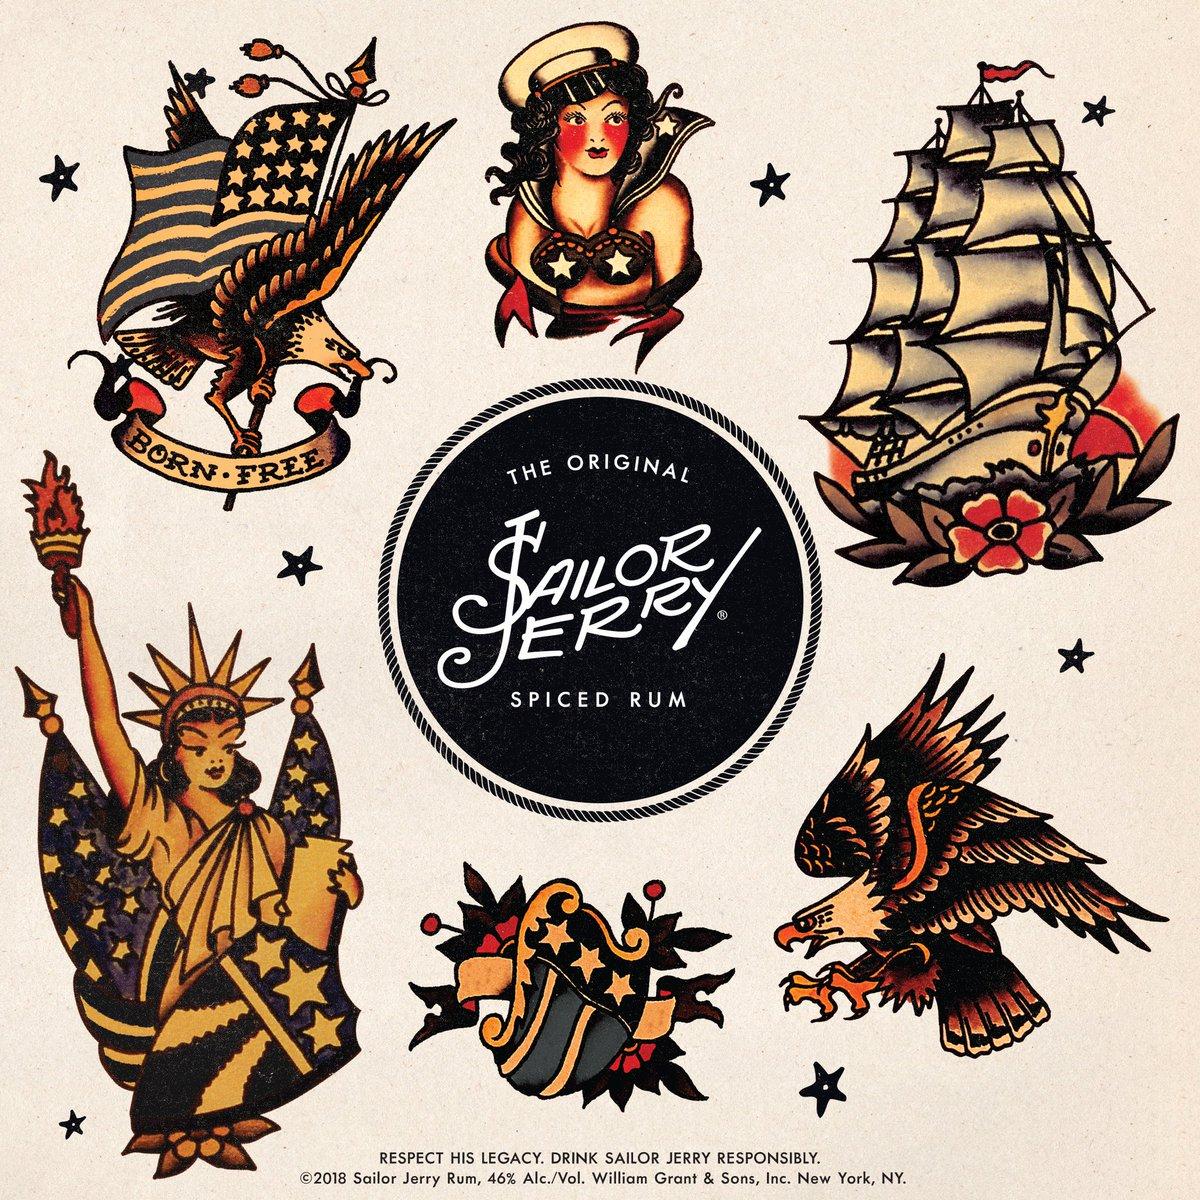 sailor jerry sailorjerry twitter